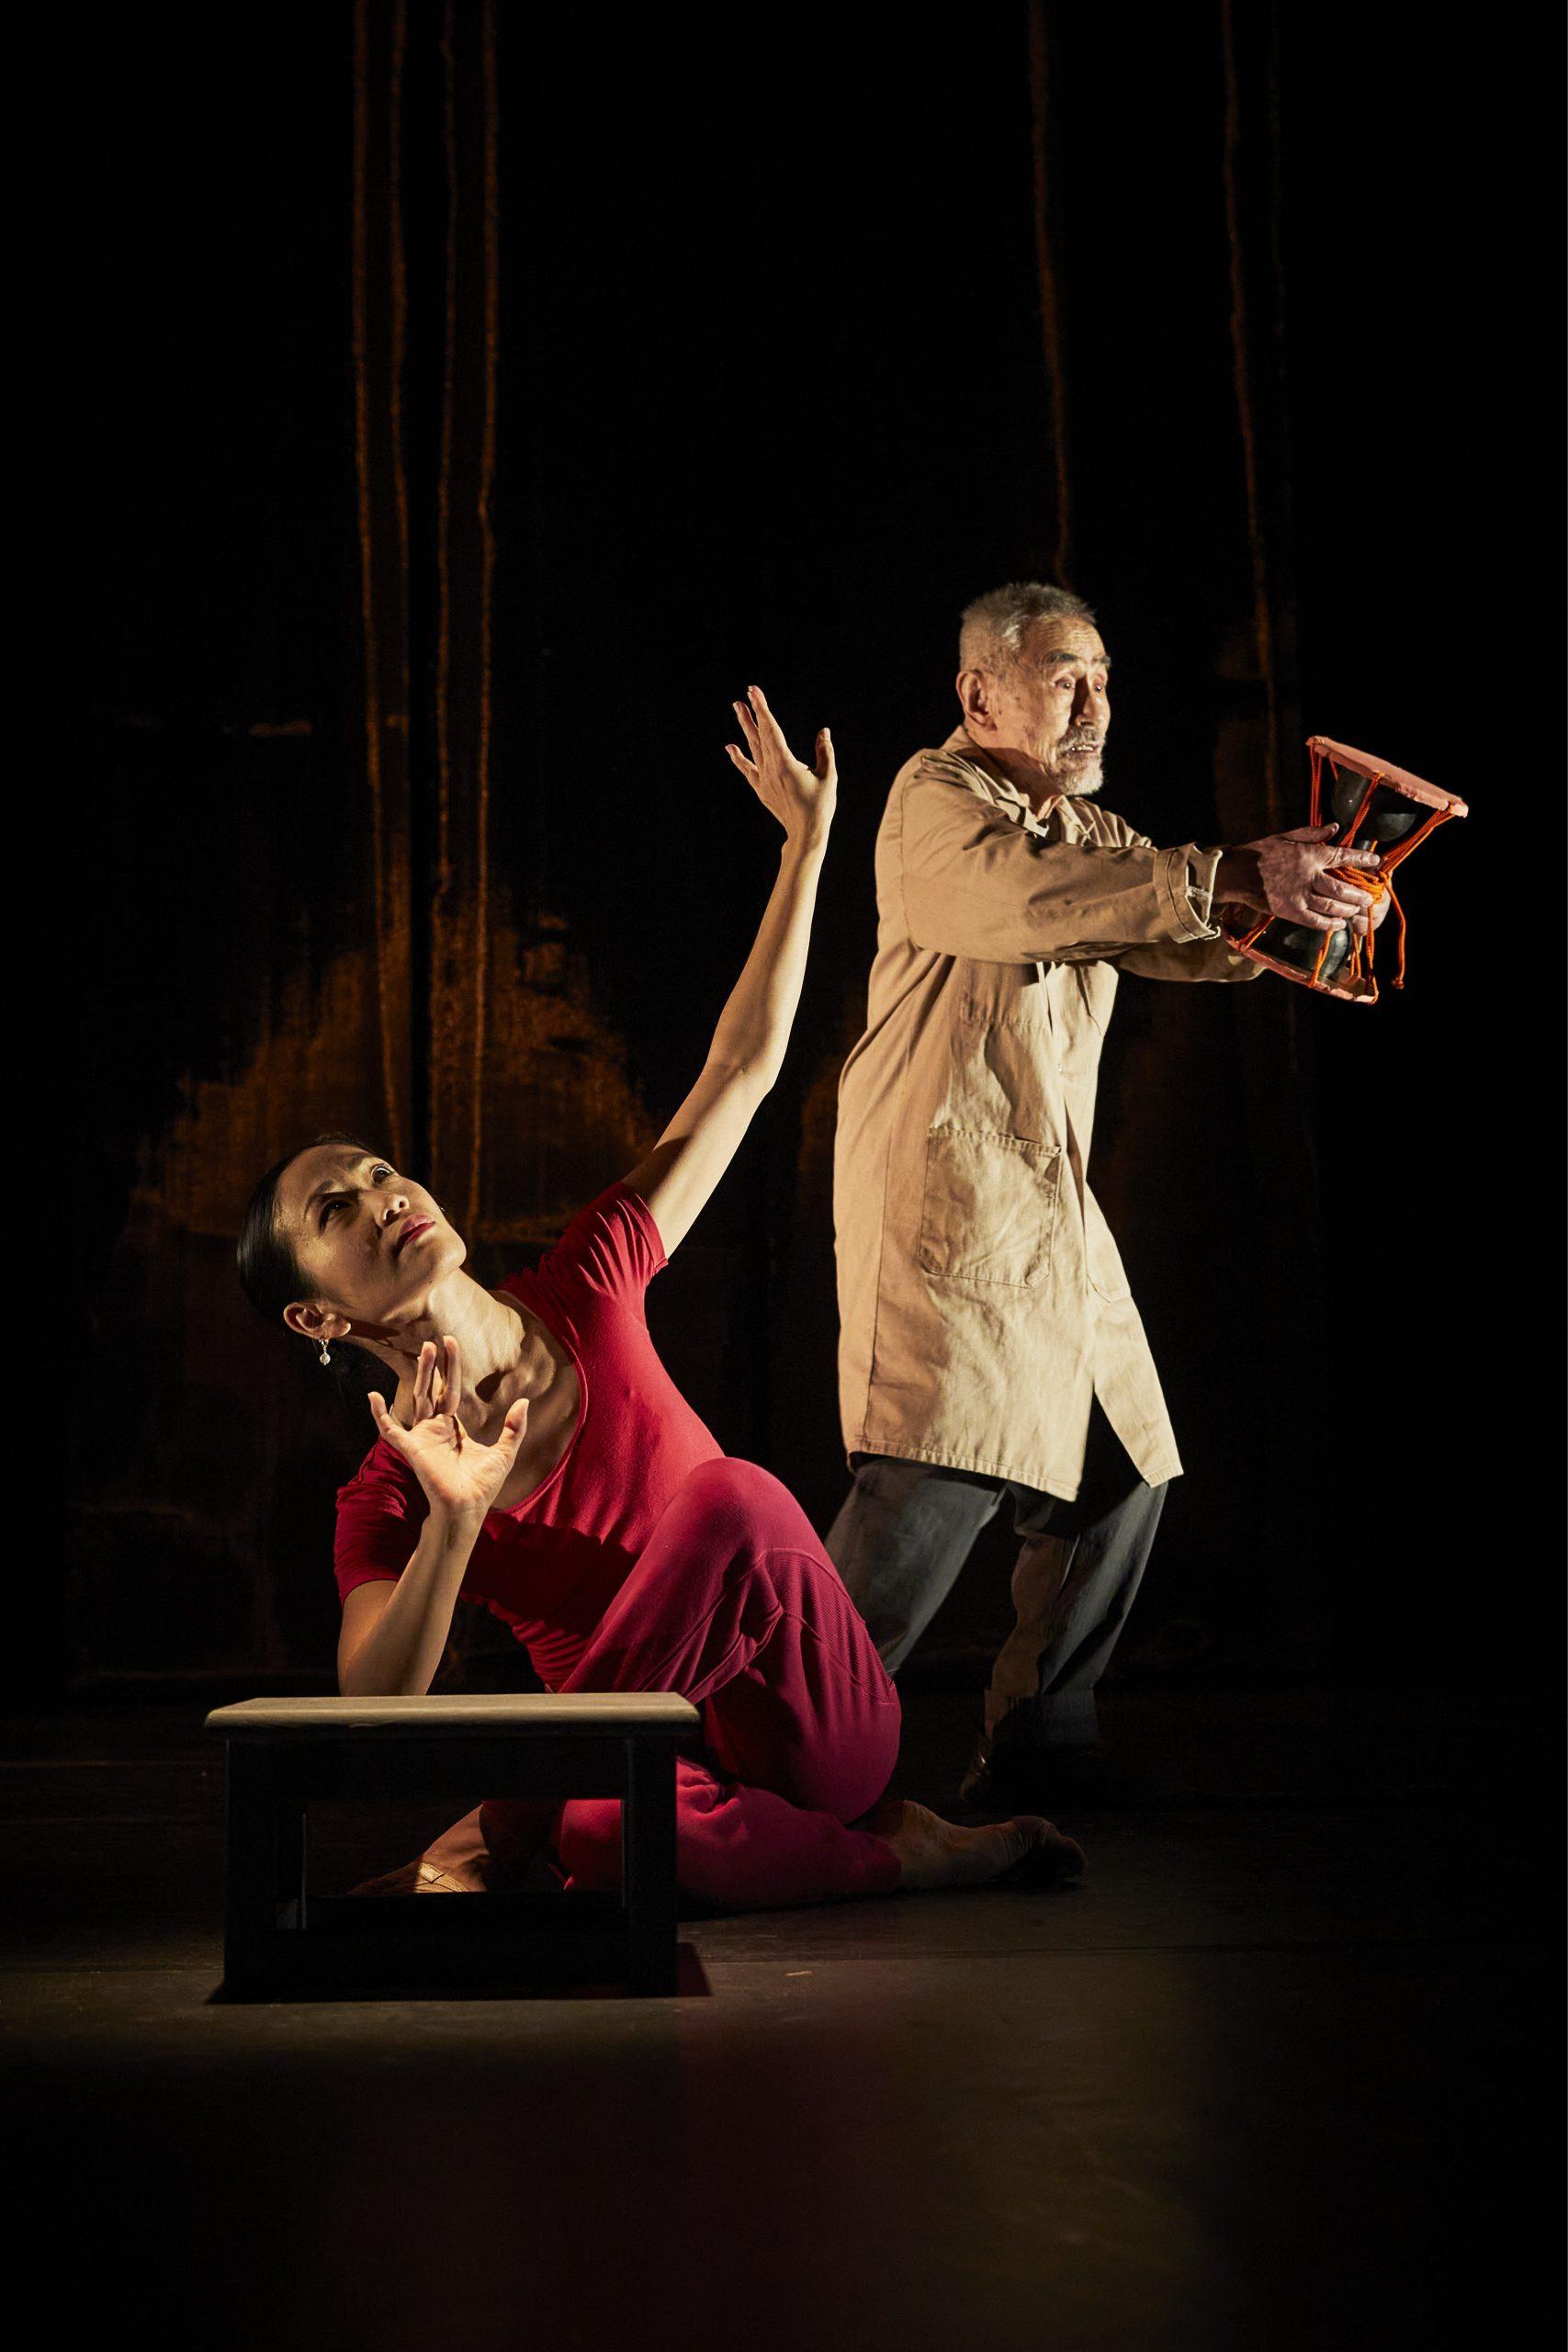 2. The Silk Drum_Christophe Raynaud de Lage